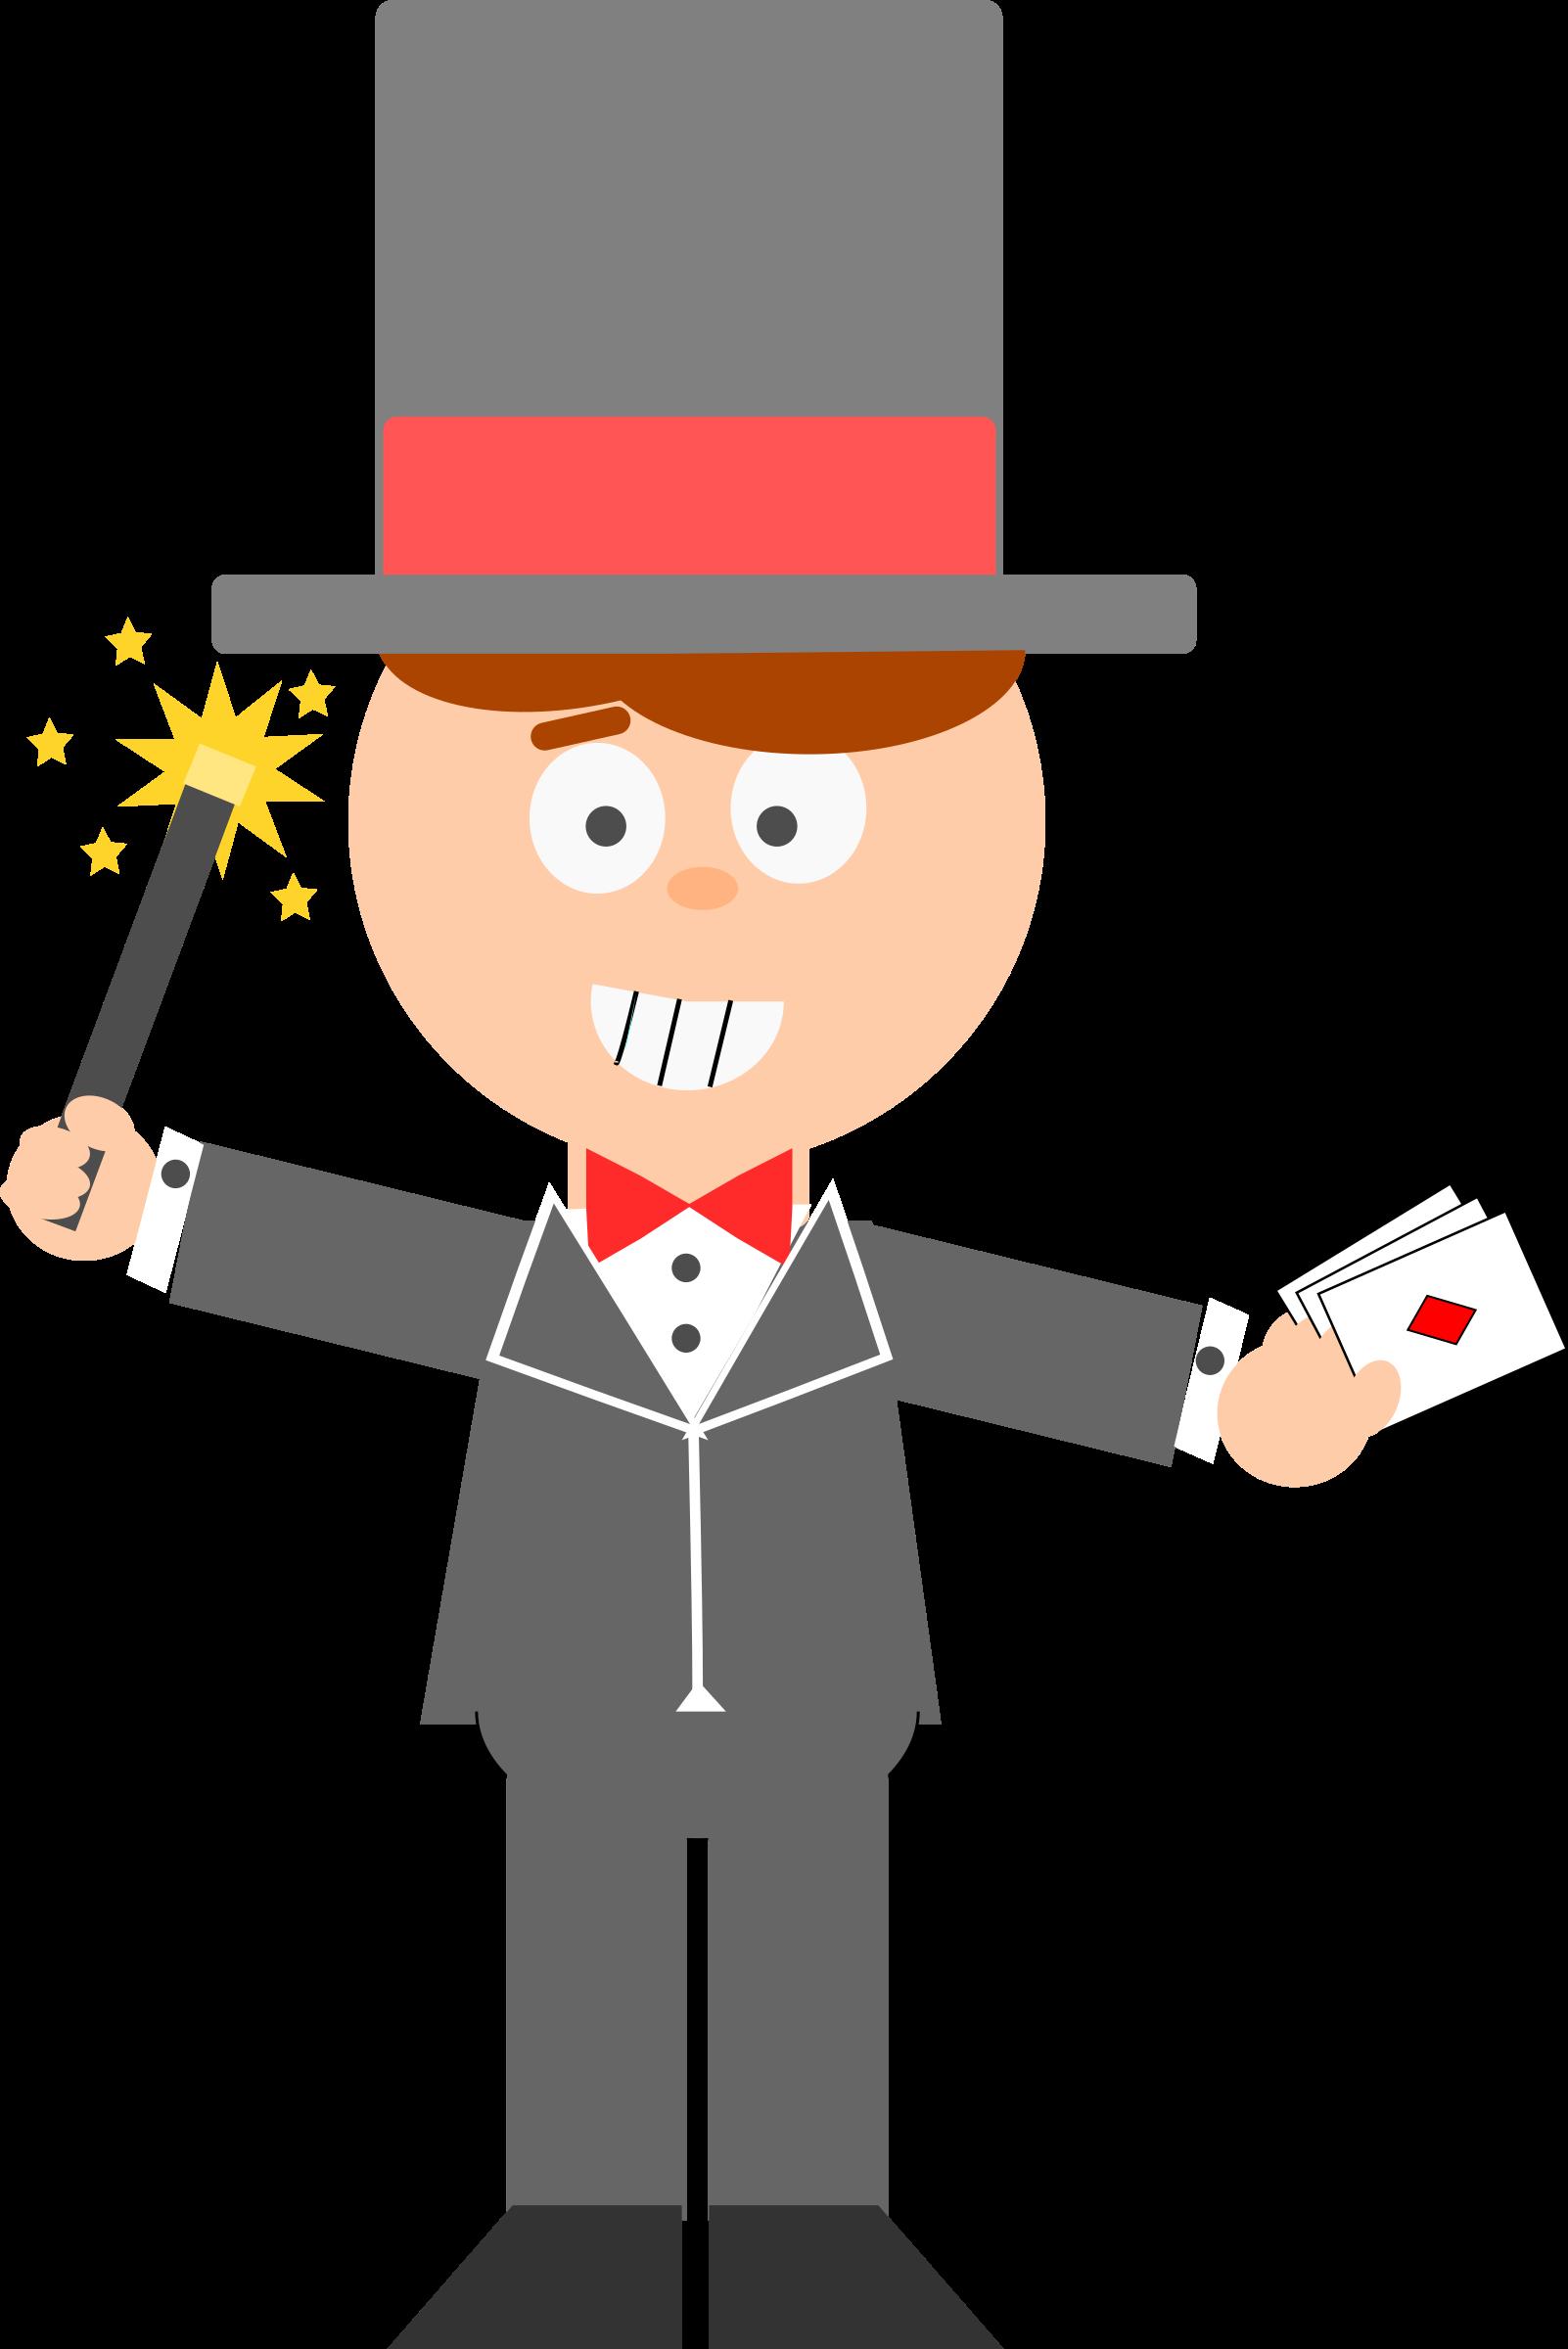 Cartoon icons png free. Magician clipart comic